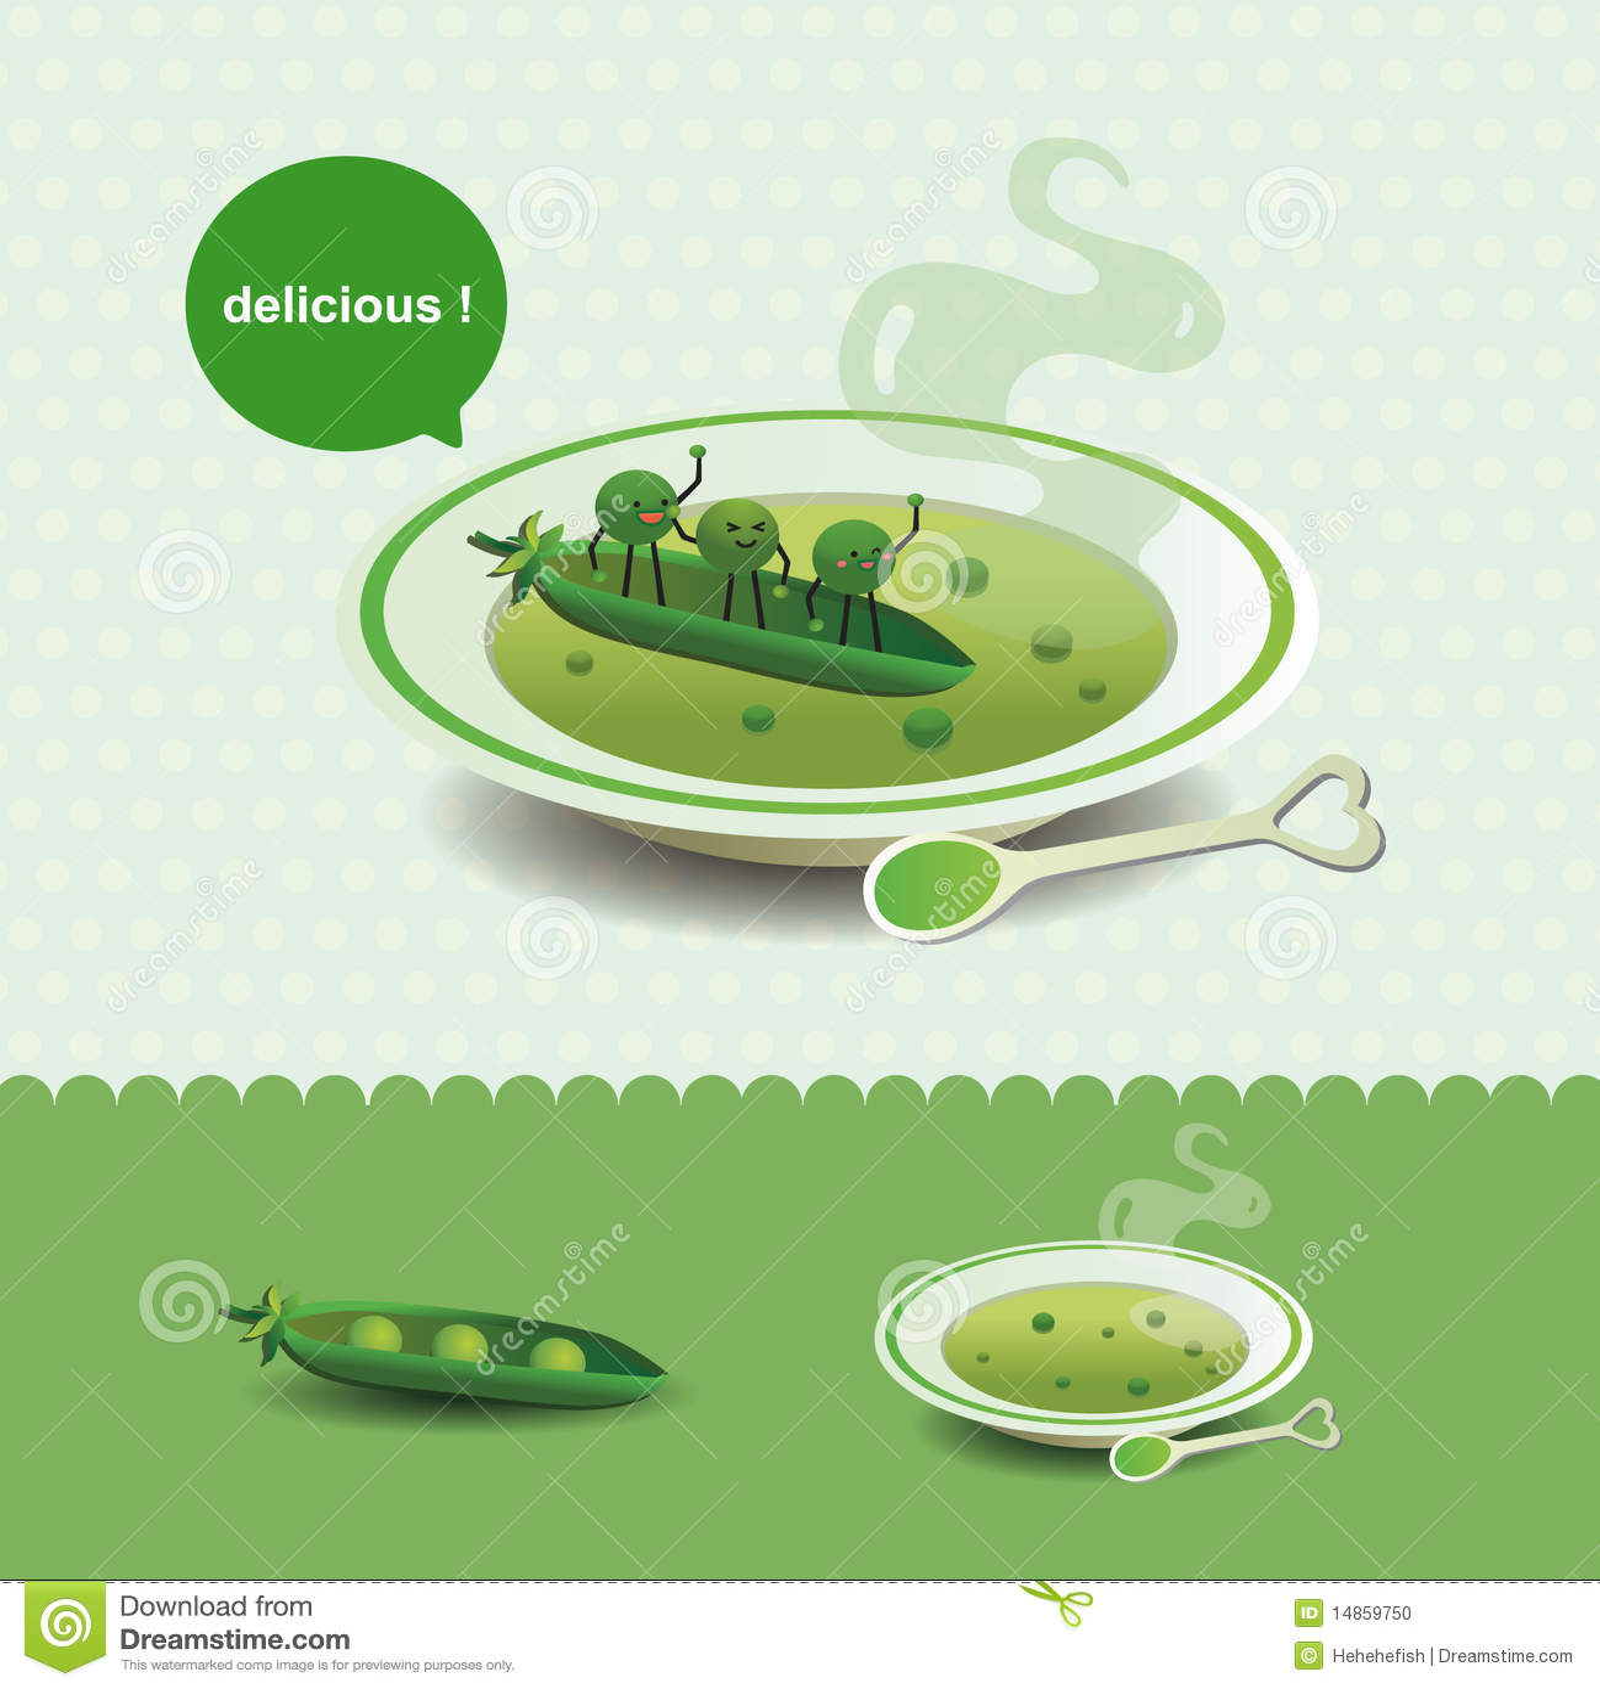 Funny pea soup